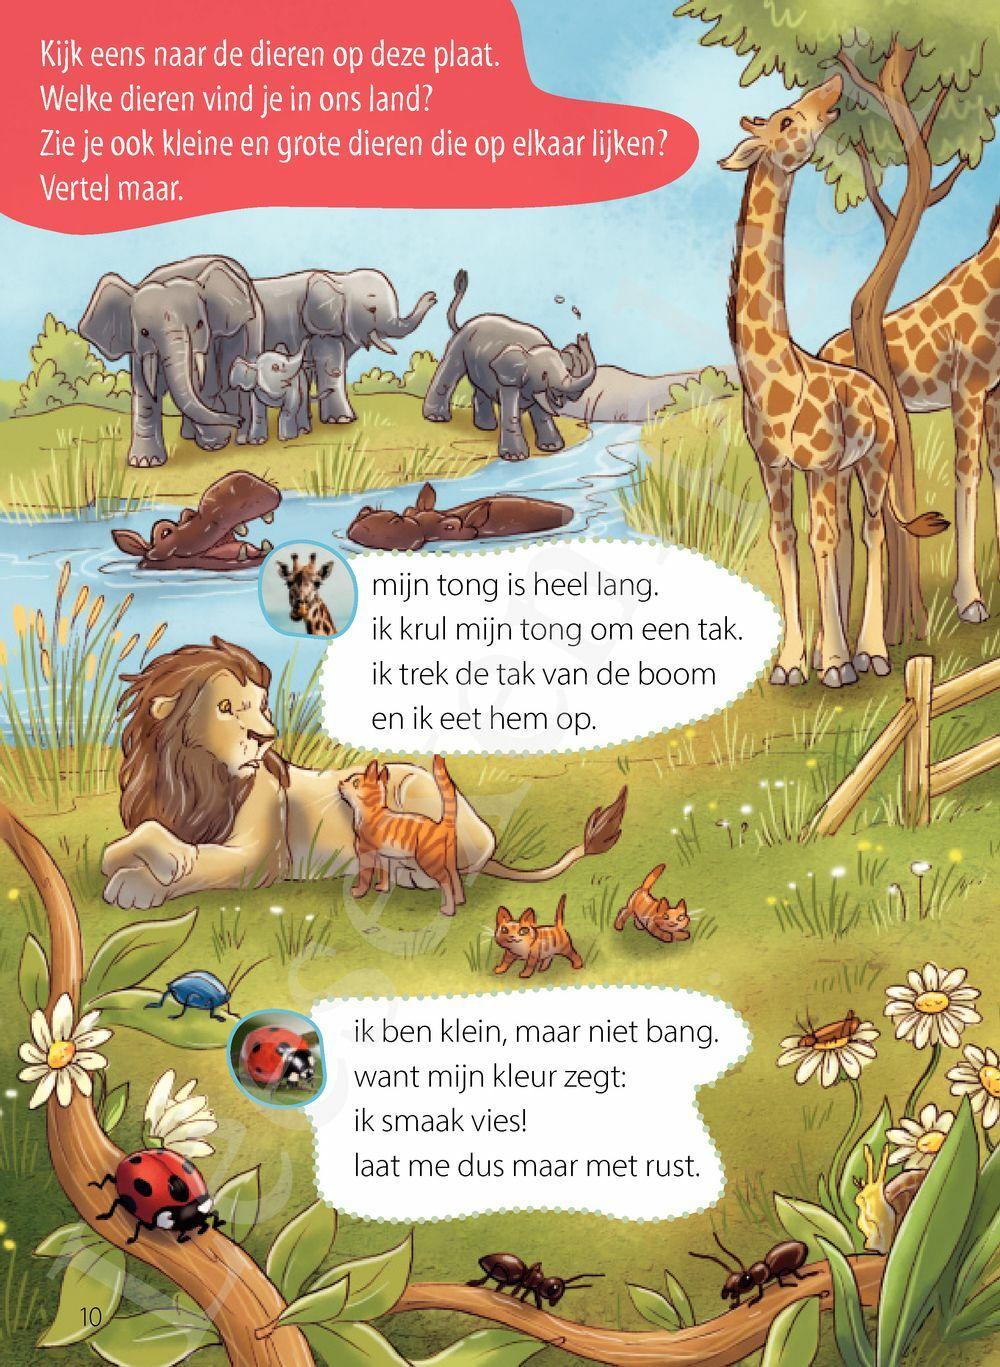 Preview: Groot of klein? Ik lees slim - weetjes over dieren